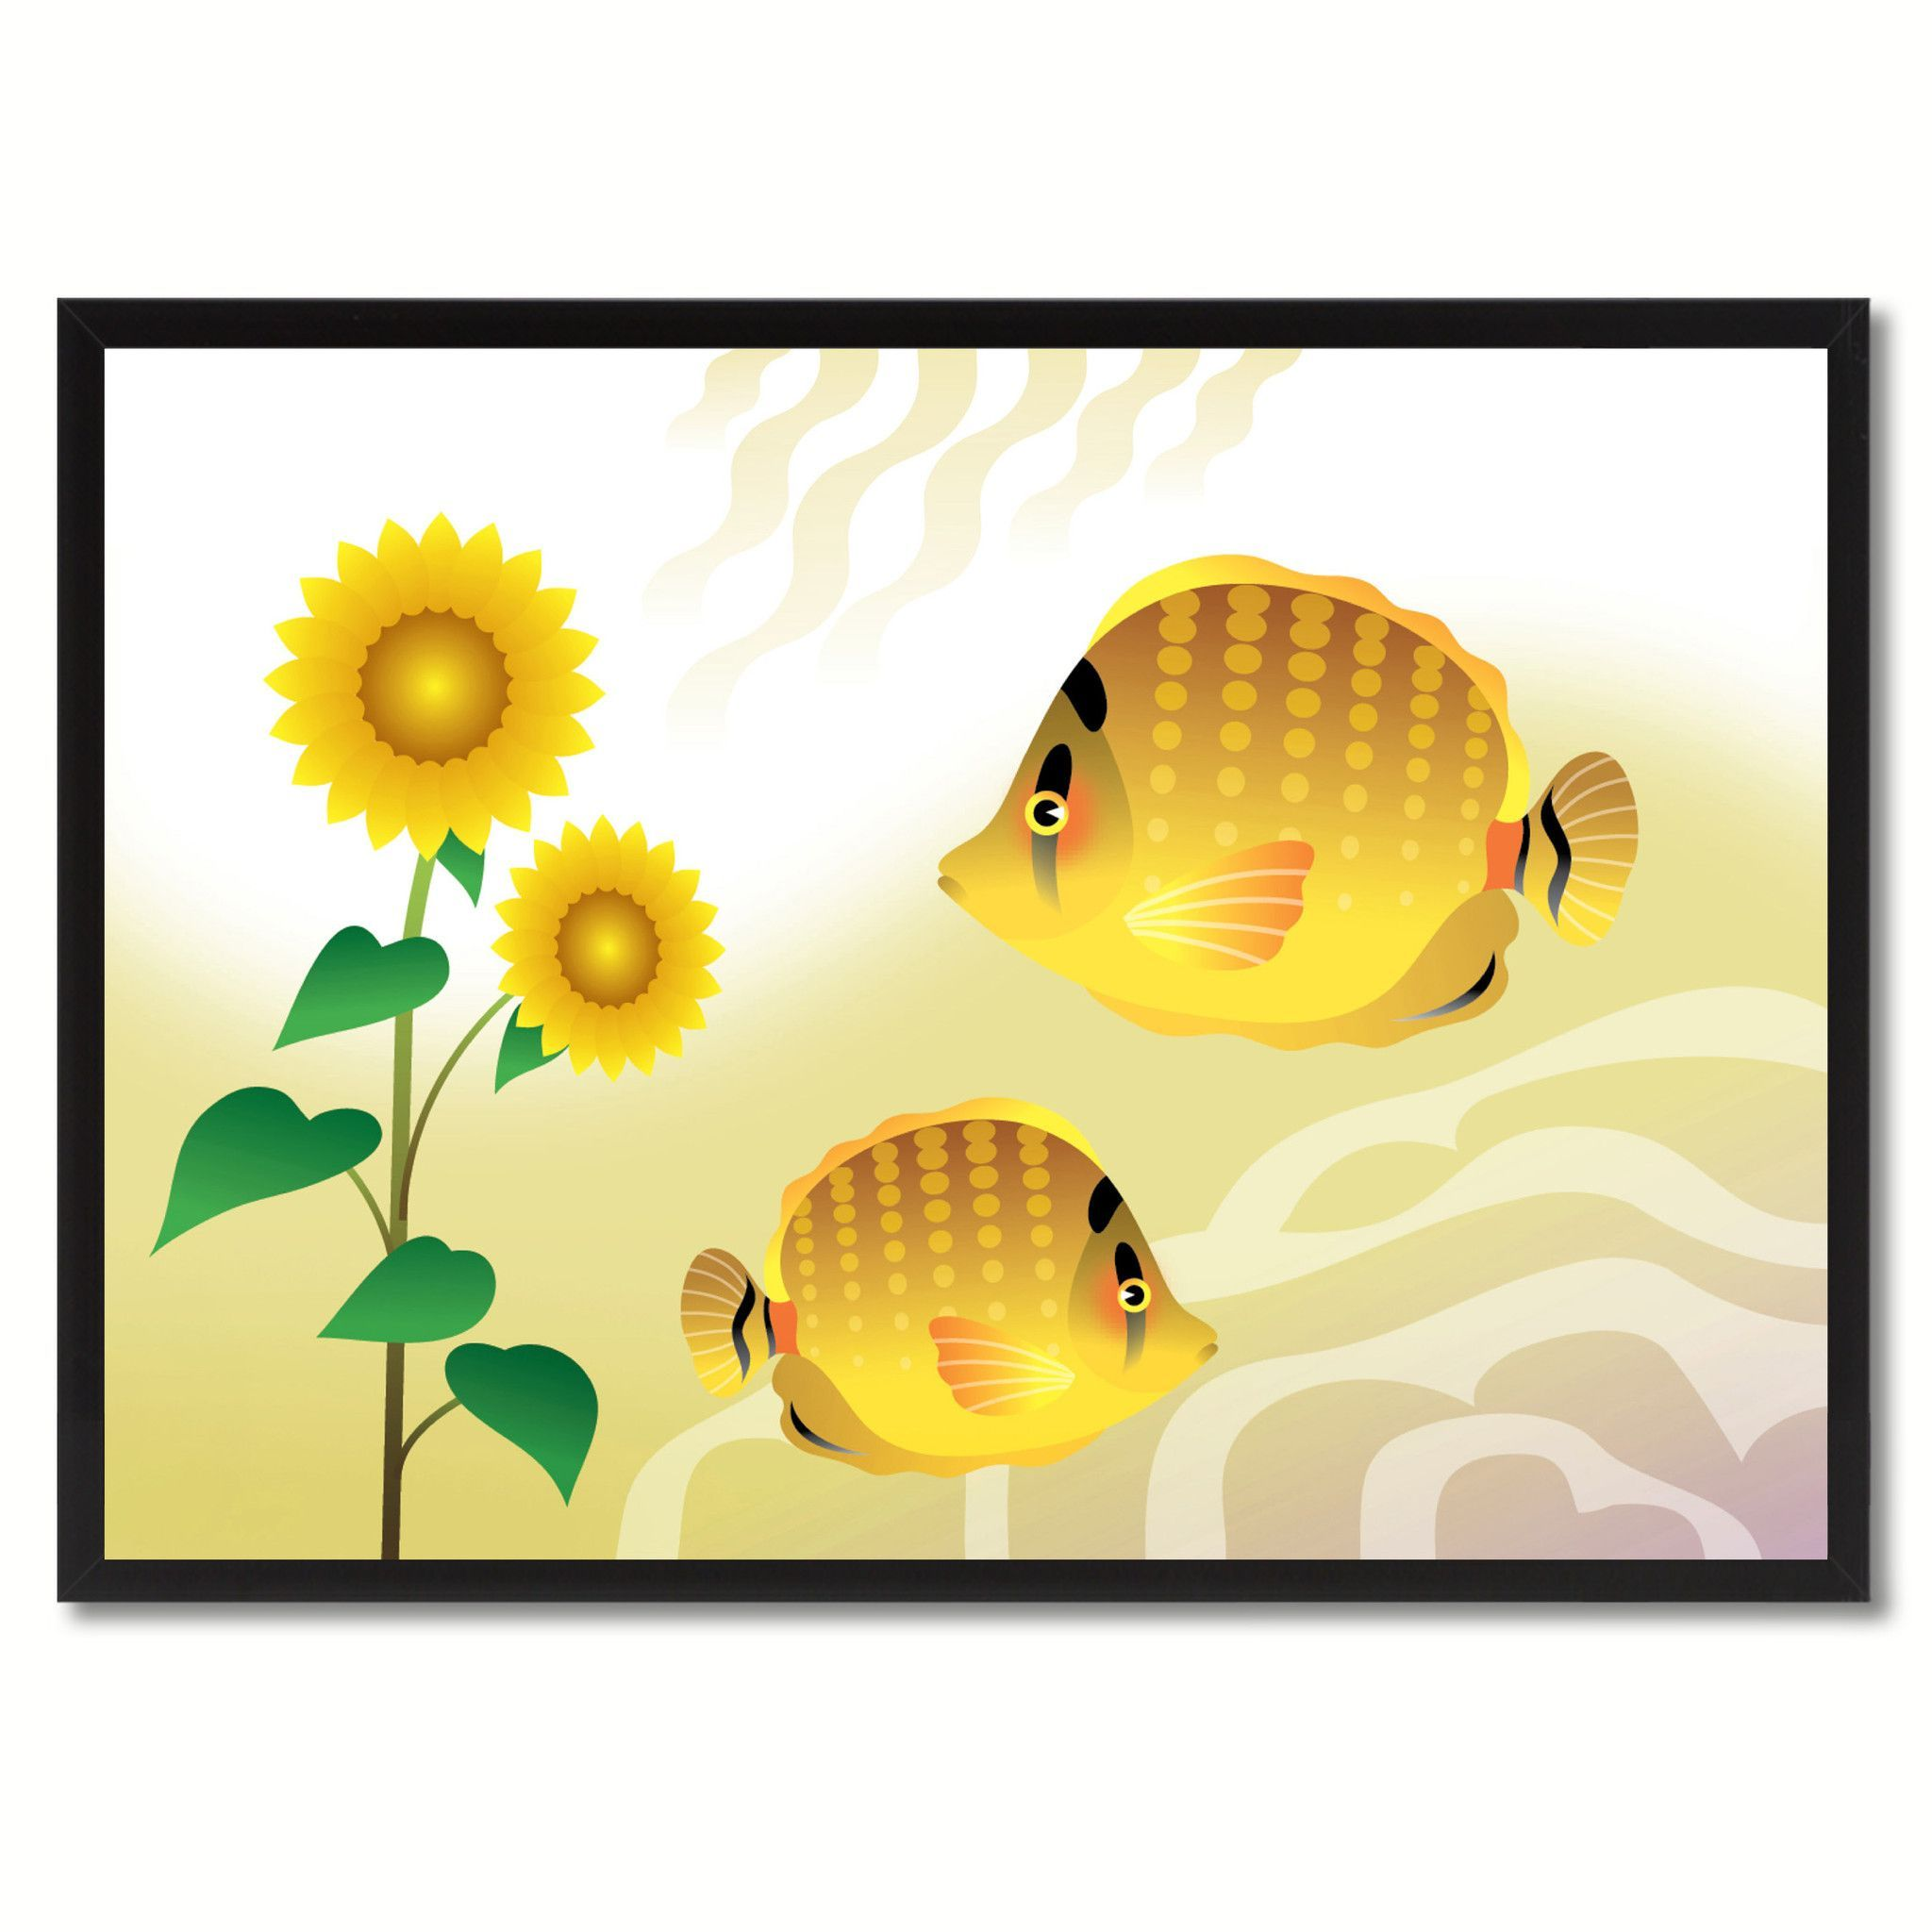 Koi Fish Wall Decor Choice Image - home design wall stickers